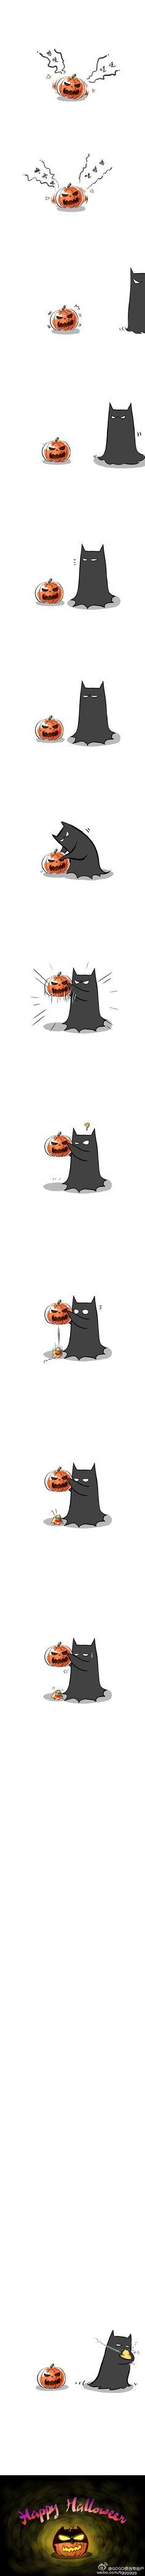 HAPPY HALLOWEEN~ #batman&robin# #Bruce# ... 来自GOGO便当专业户 - 微博